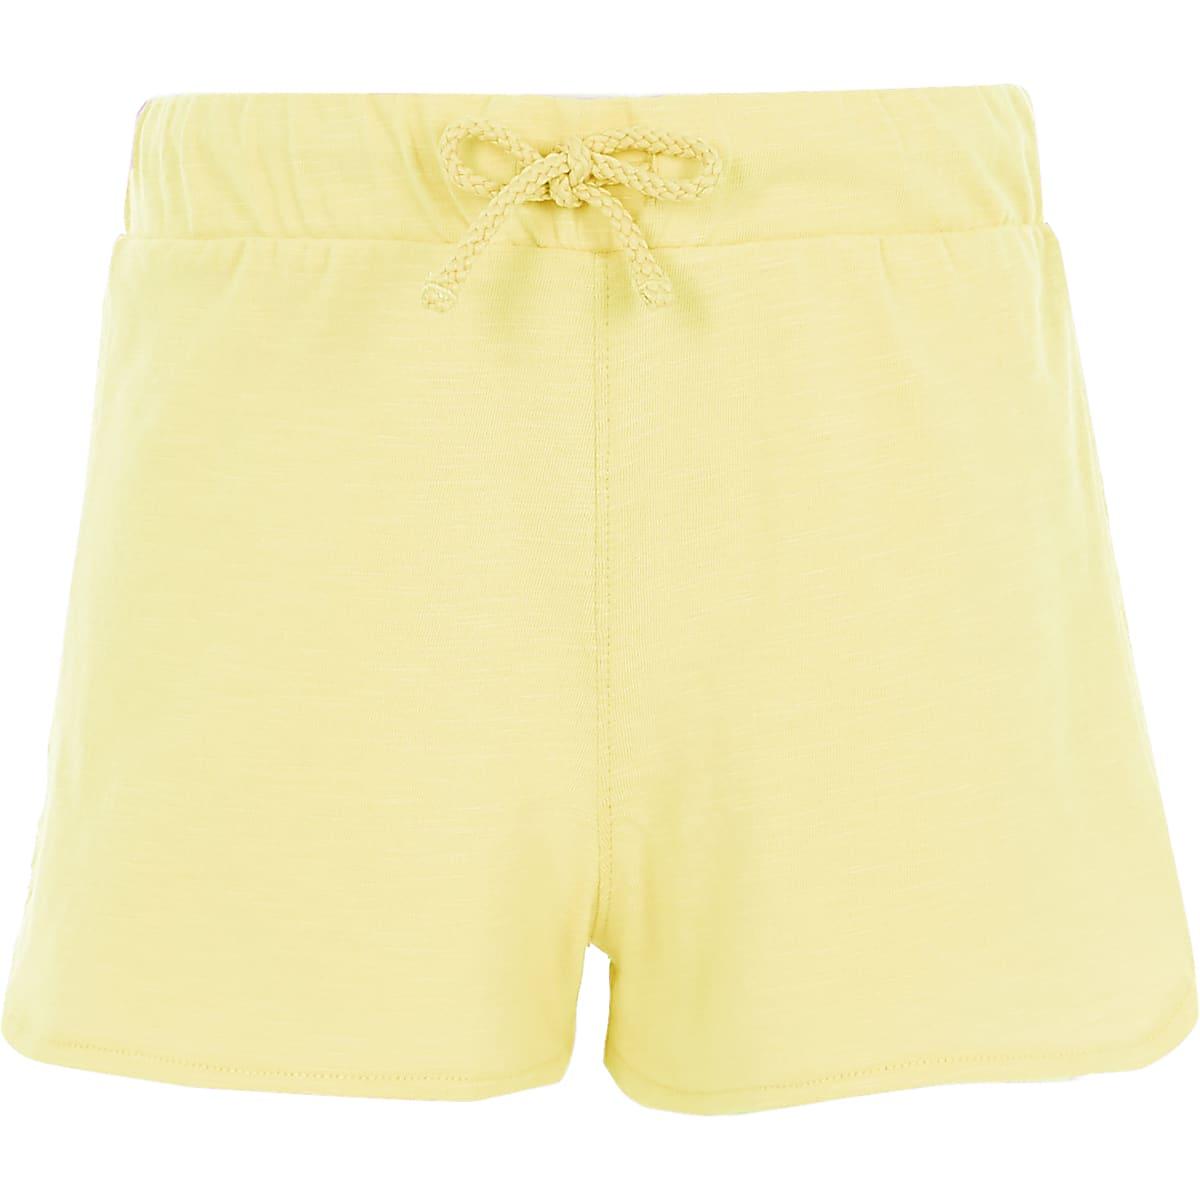 Girls yellow crochet side runner shorts